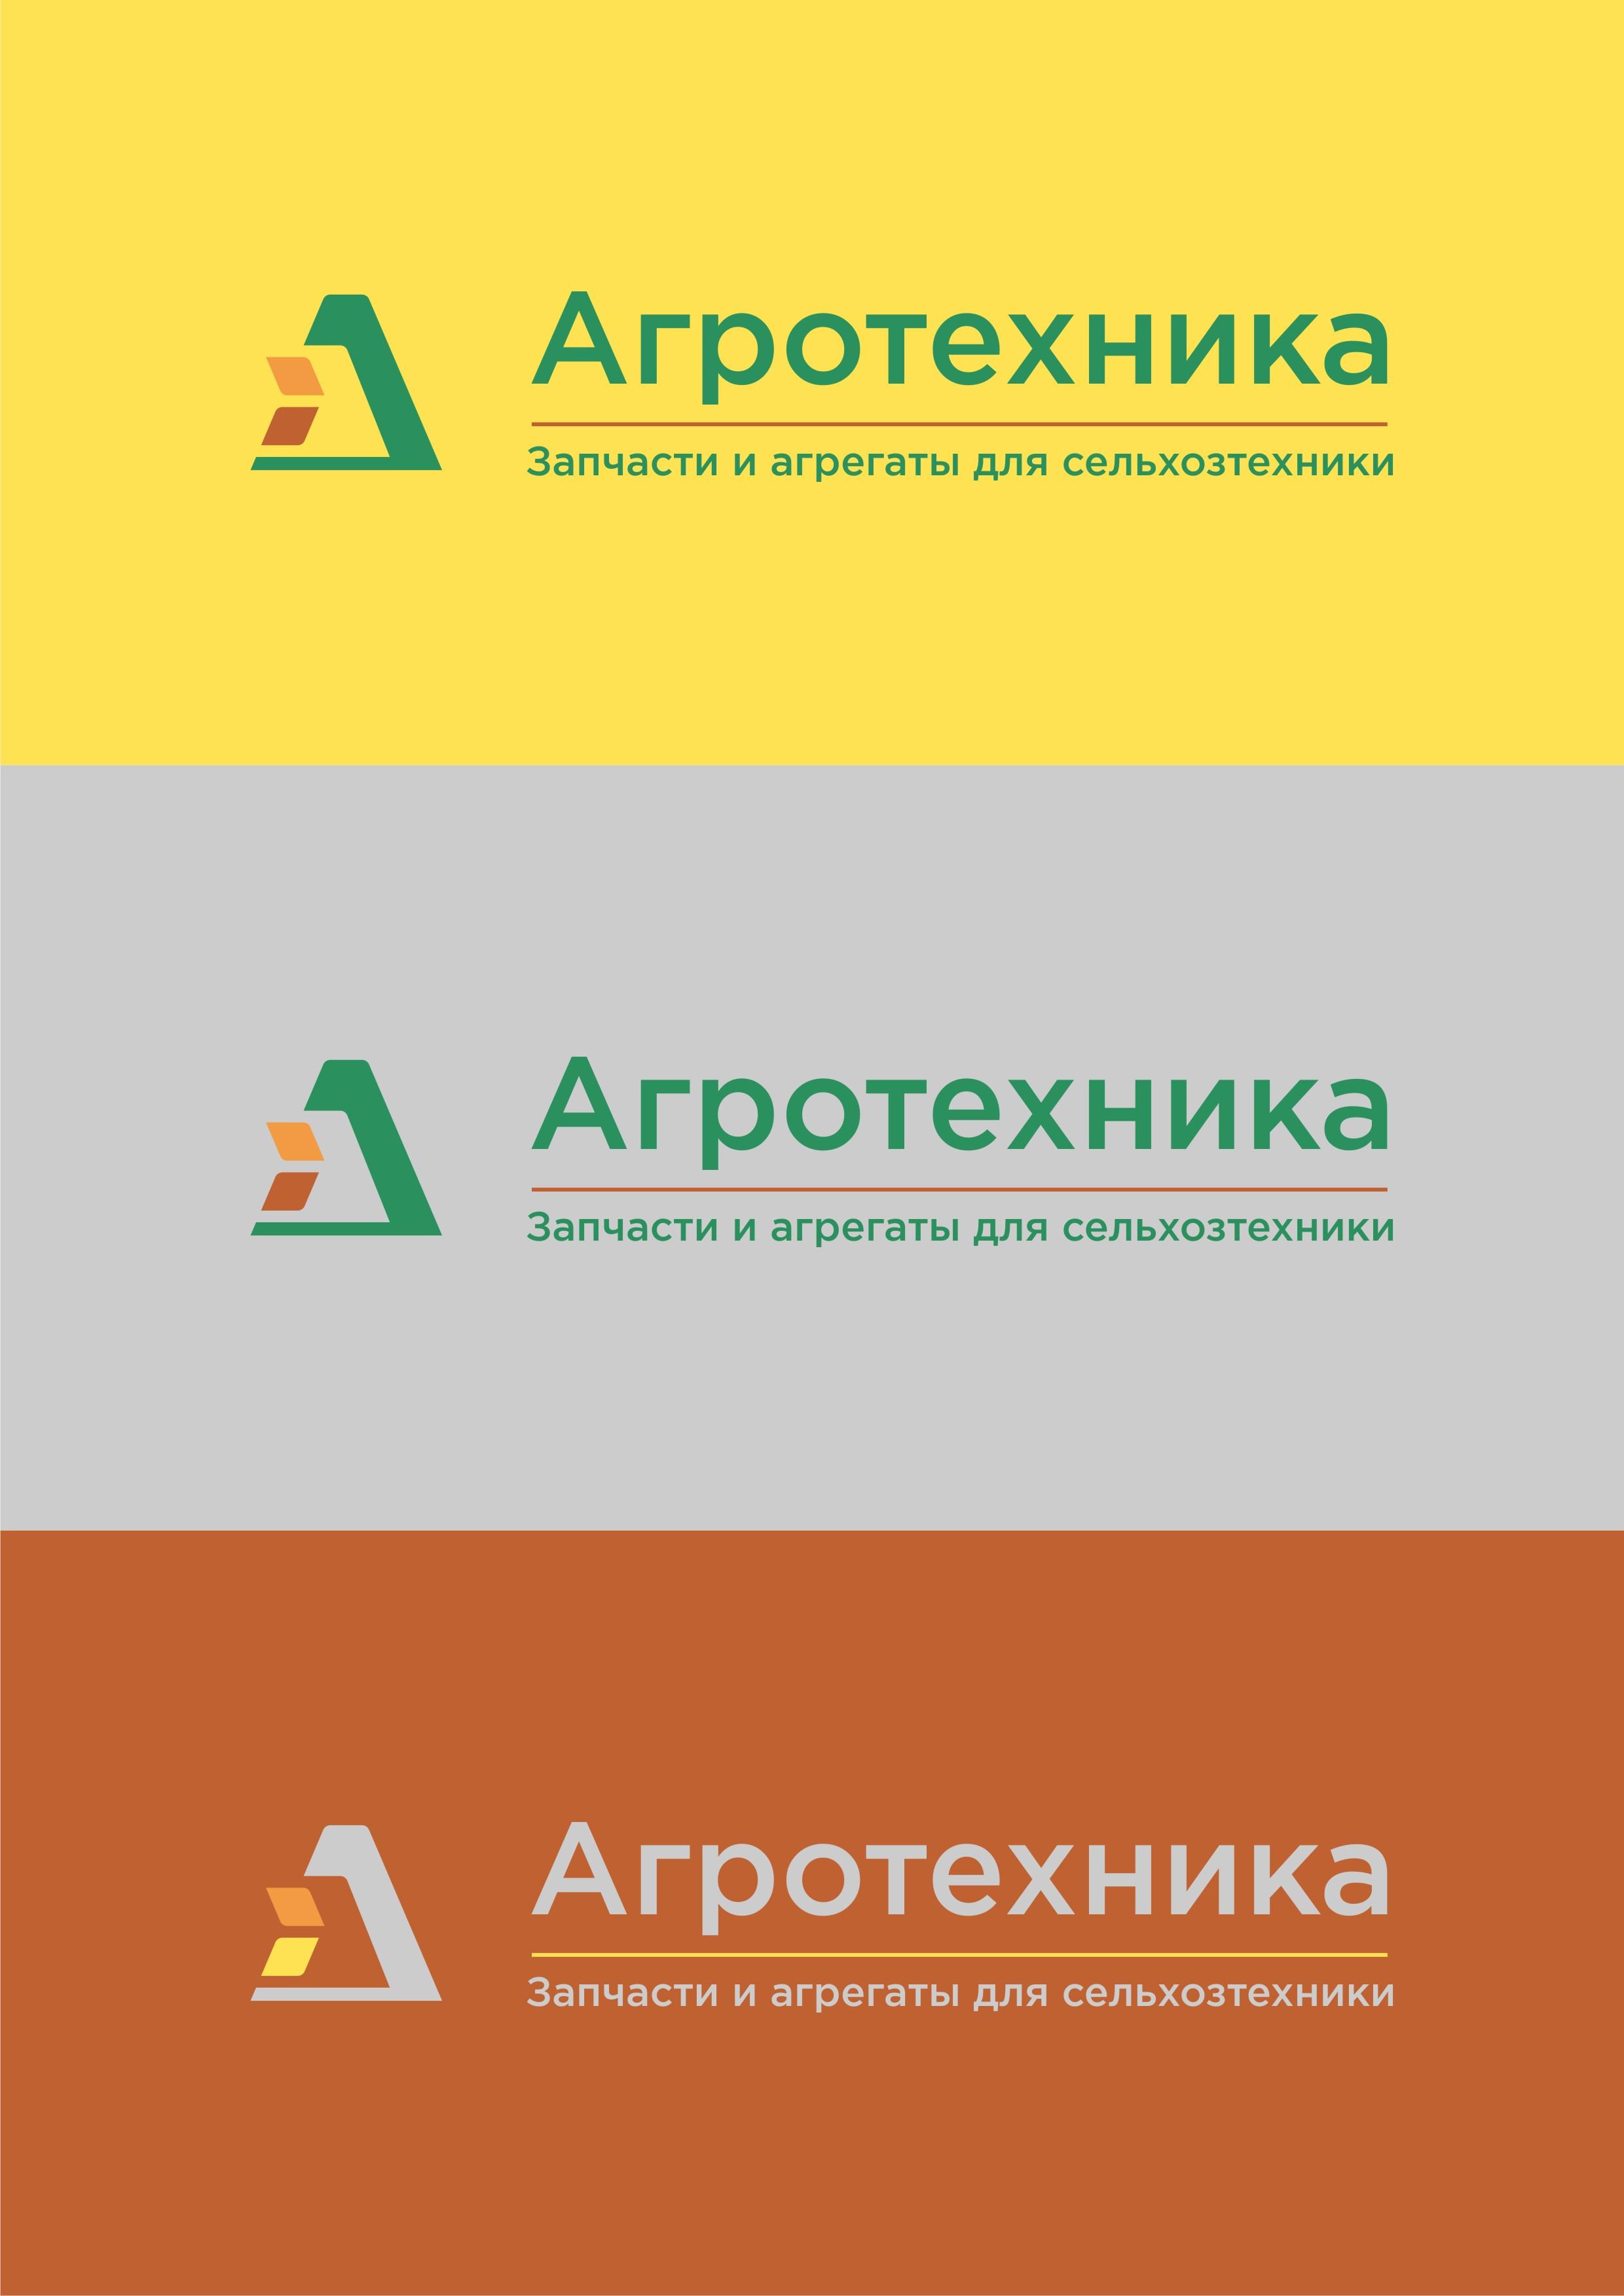 Разработка логотипа для компании Агротехника фото f_2035c0778f934776.jpg